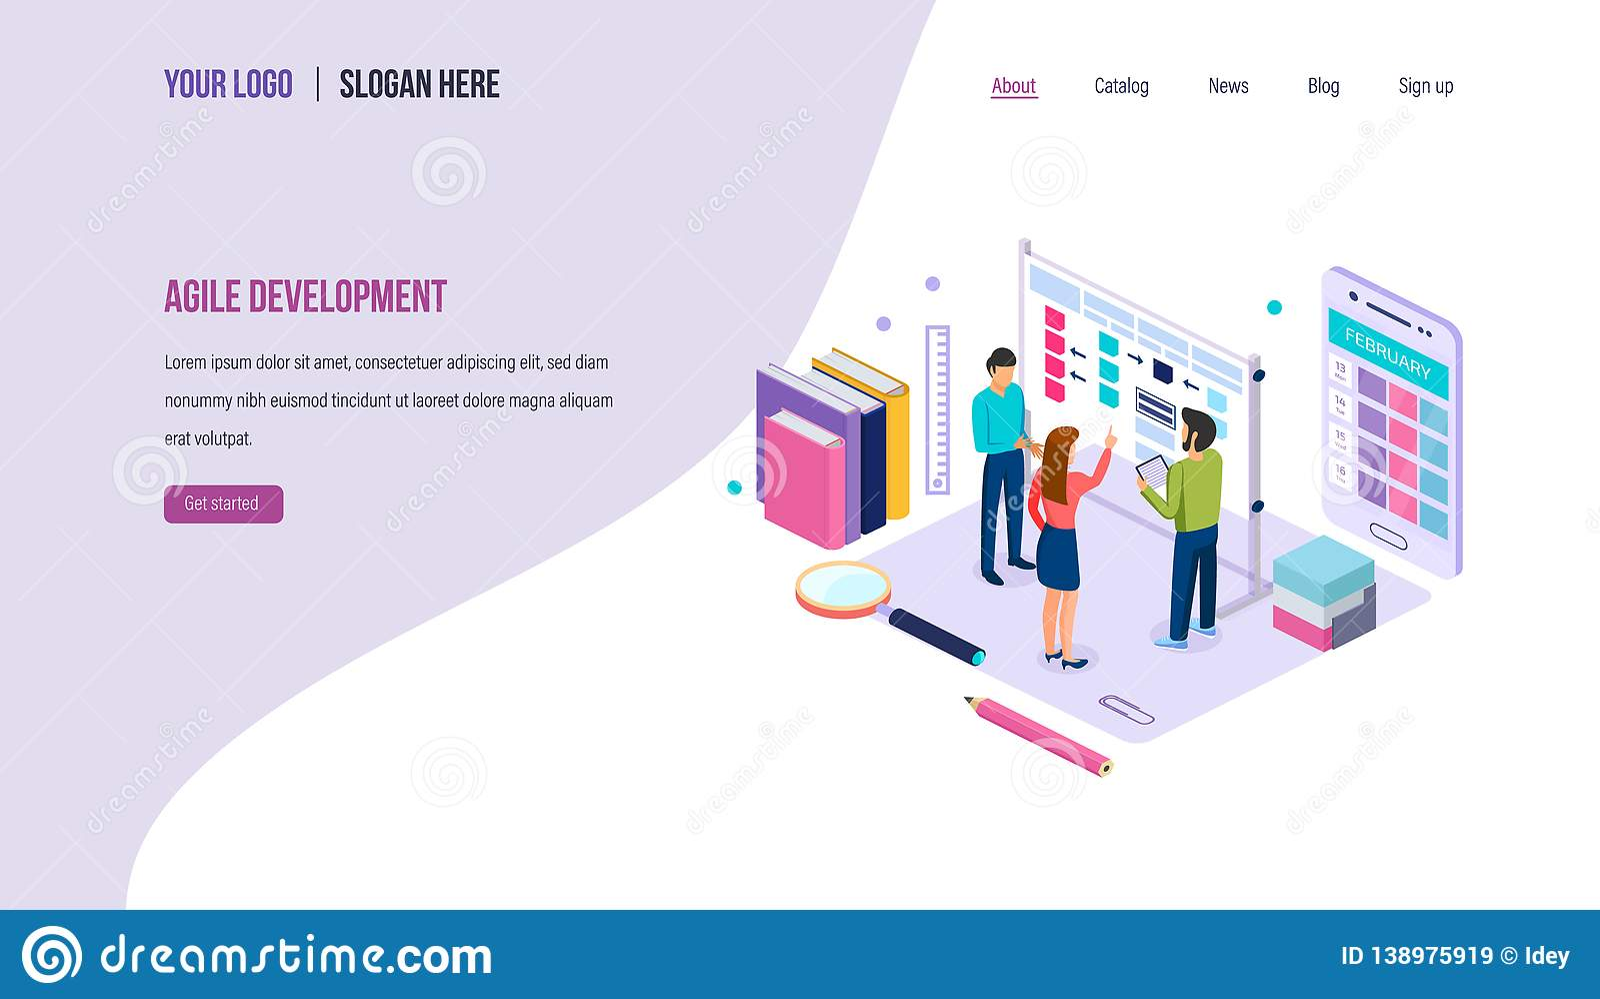 Agile development. Teamwork on project using agile technology, strategic planning.